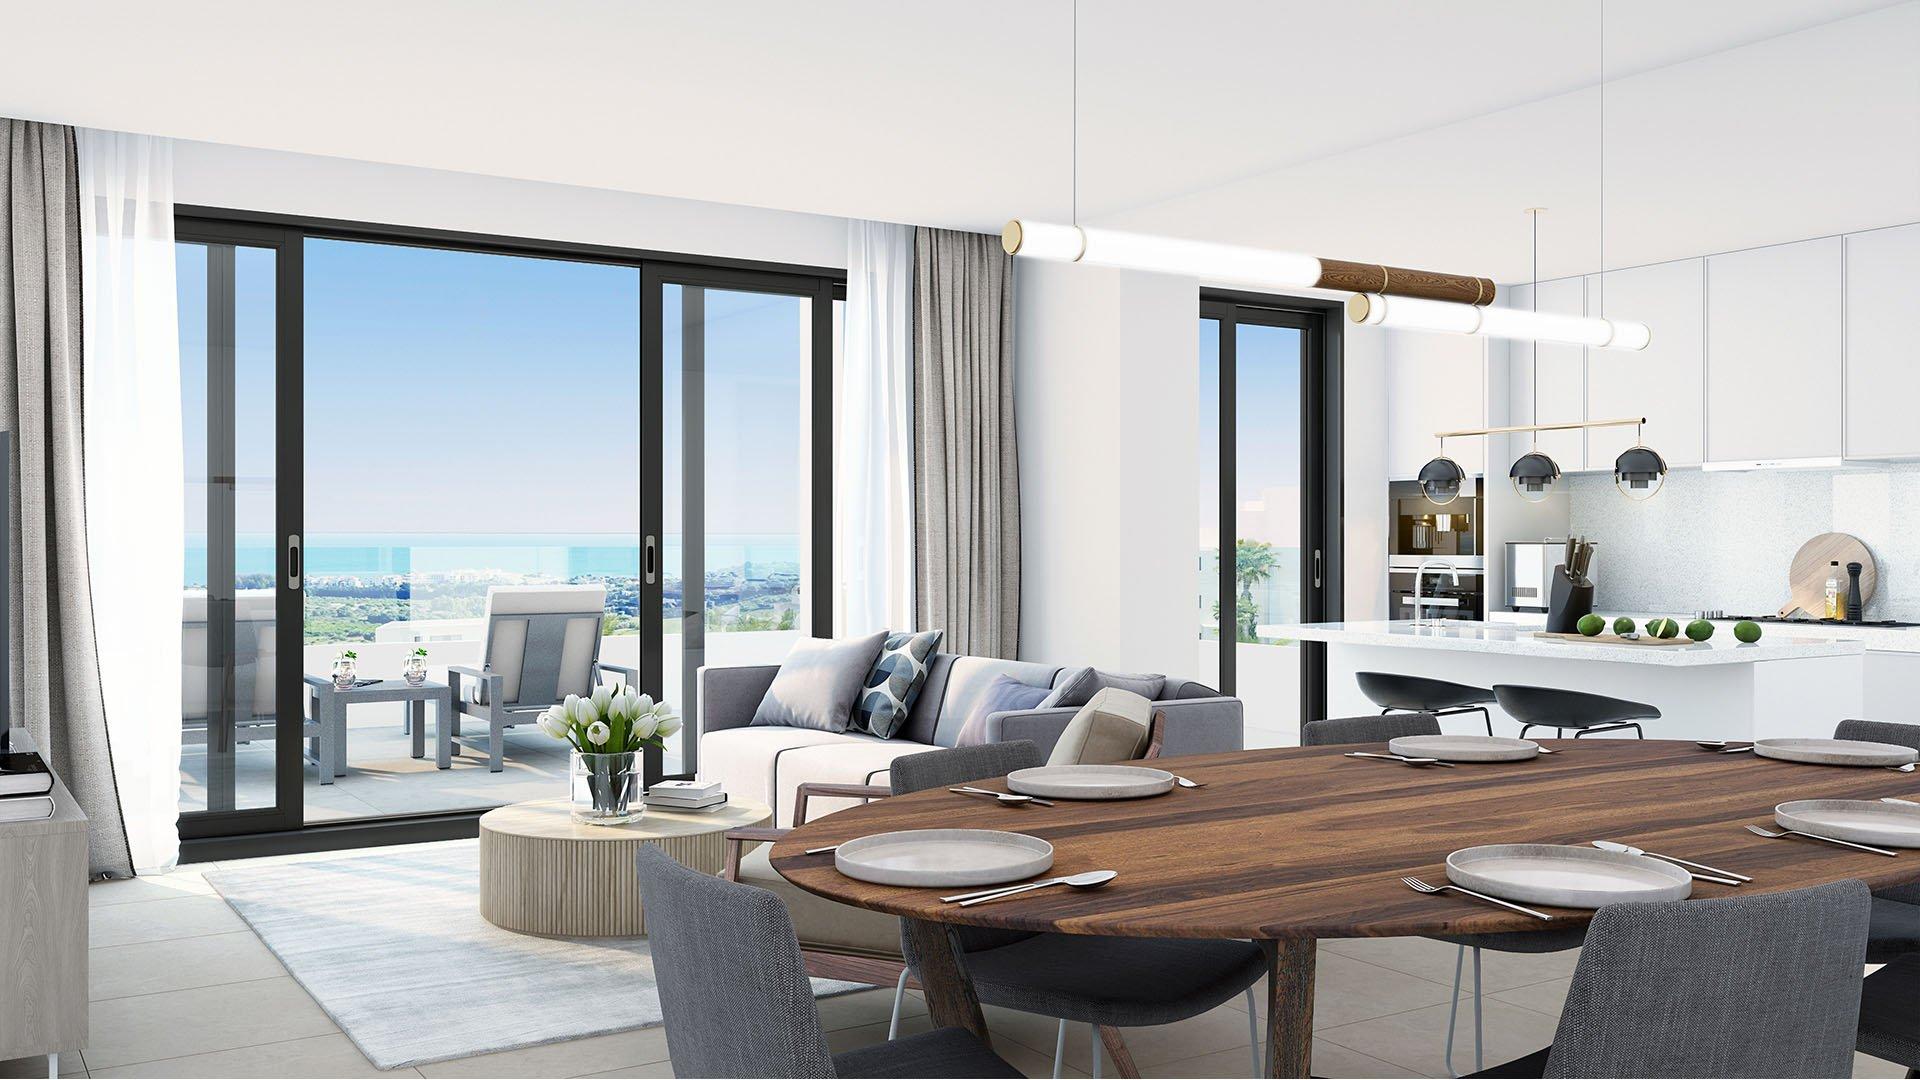 Mesas Homes: Apartments with phenomenal views near Estepona